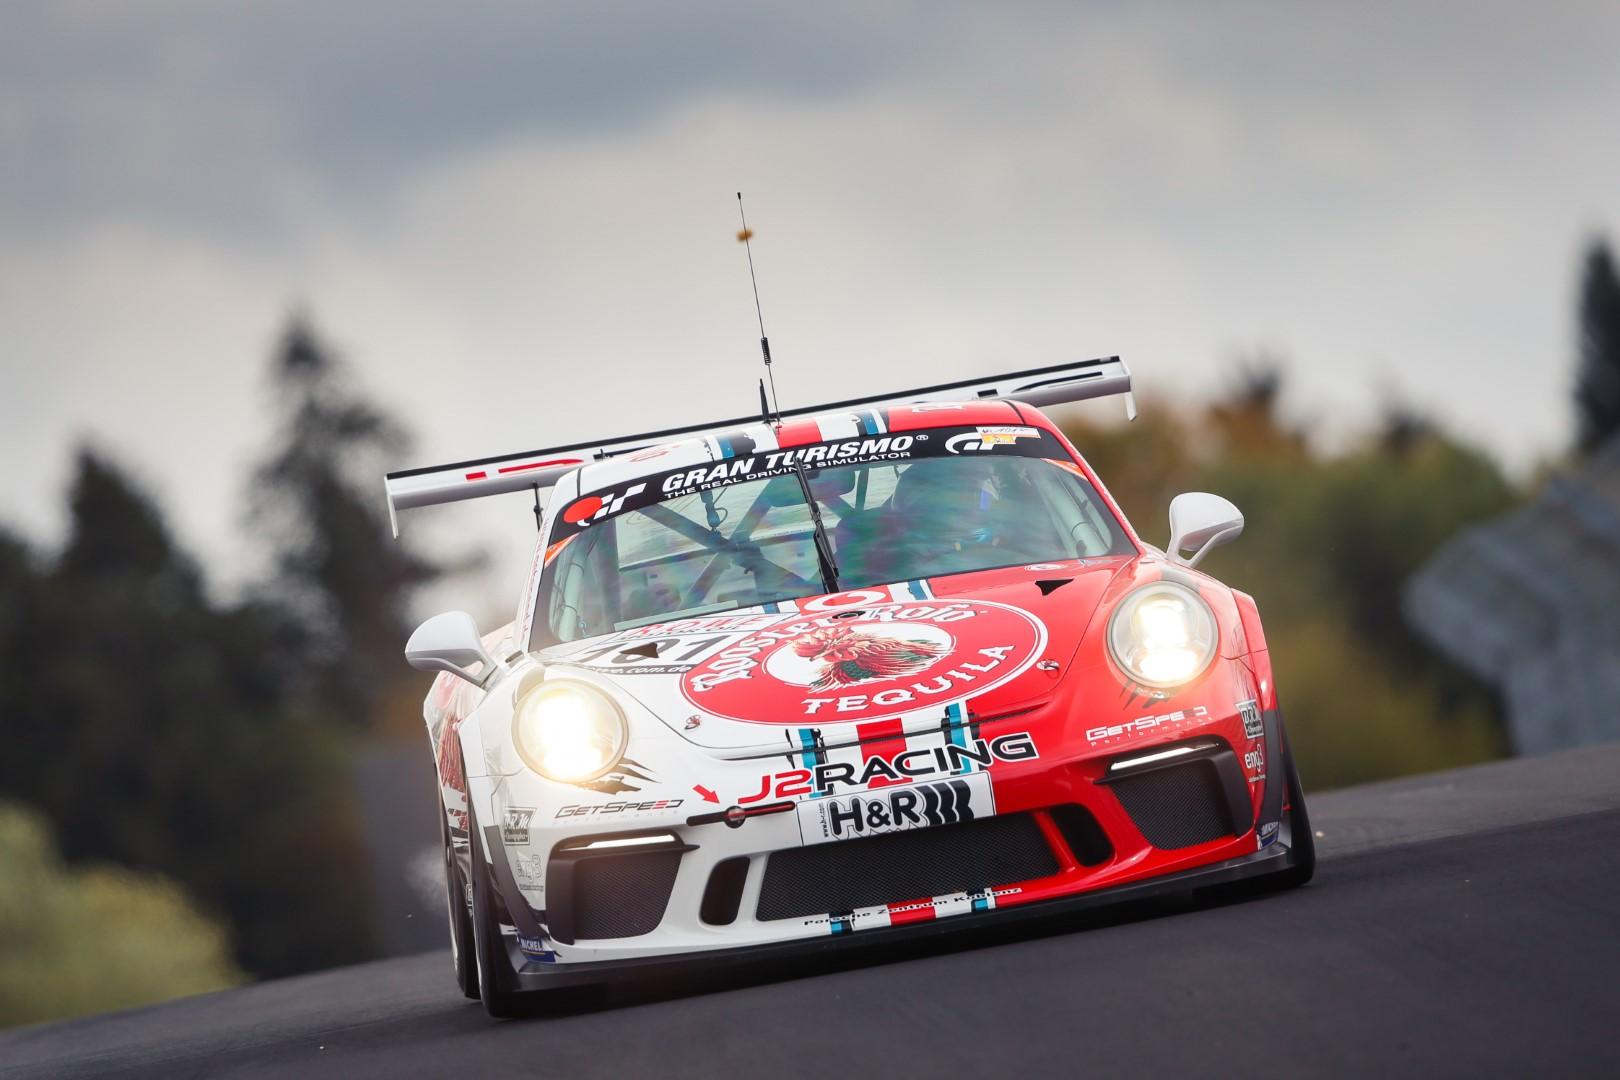 VLN 7. Lauf 2018, Nürburgring-Nordschleife - Foto: Gruppe C Photography; #101 Porsche 911 GT3 Cup, GIGASPEED Team GetSpeed Performance: John Shoffner, Janine Hill, Fabian Schiller